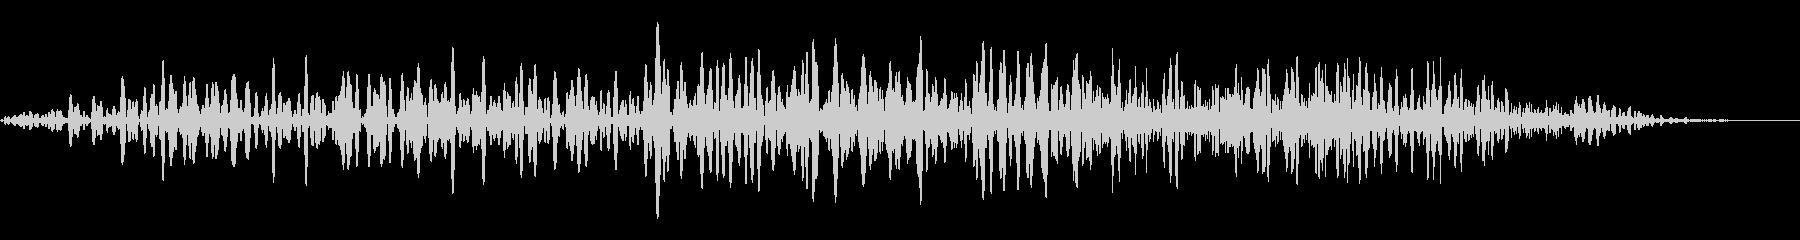 LC IMPフレーム8Cの未再生の波形